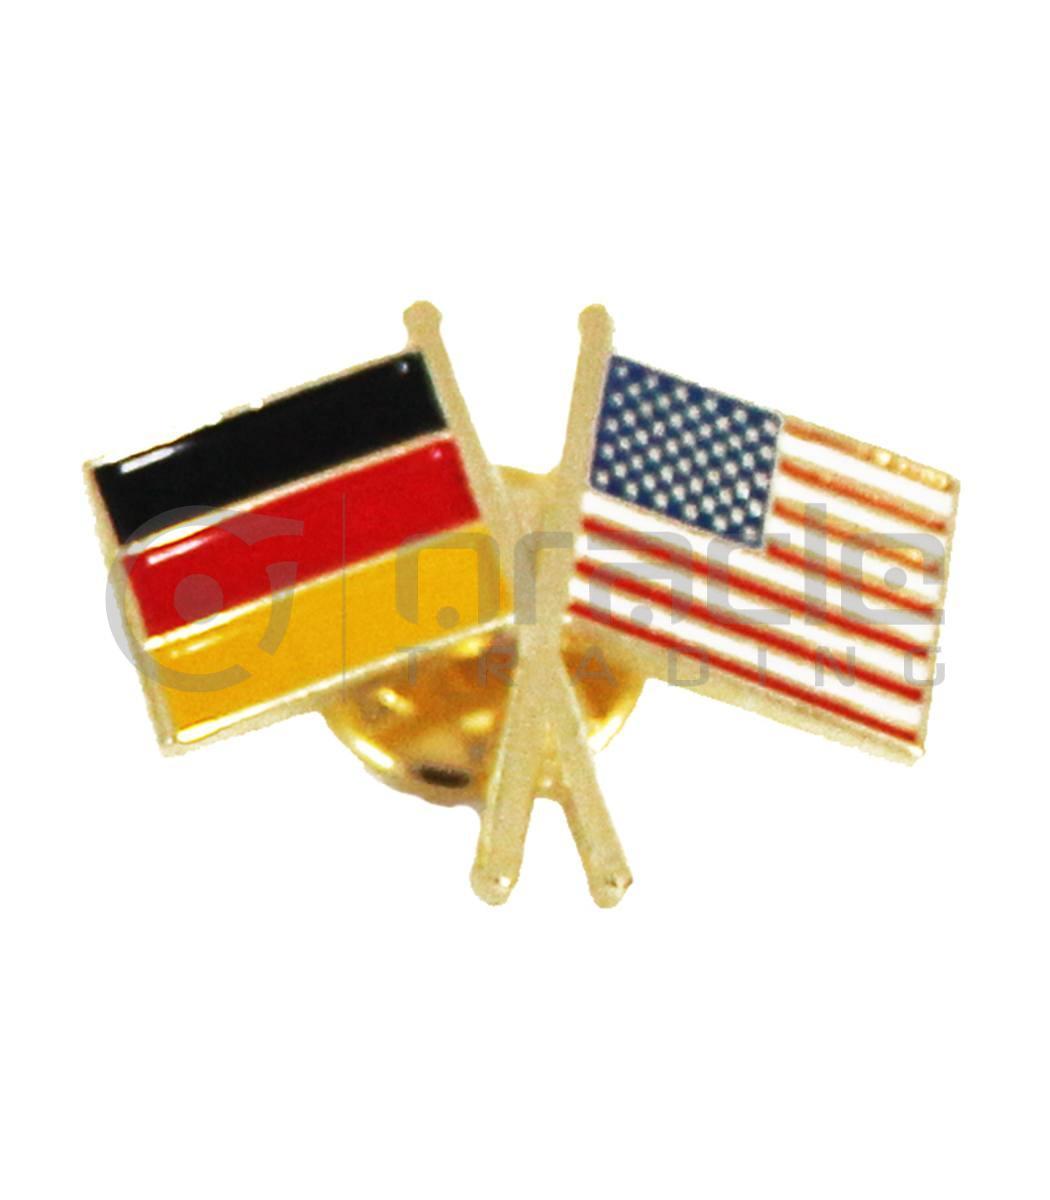 Germany / USA Friendship Lapel Pin